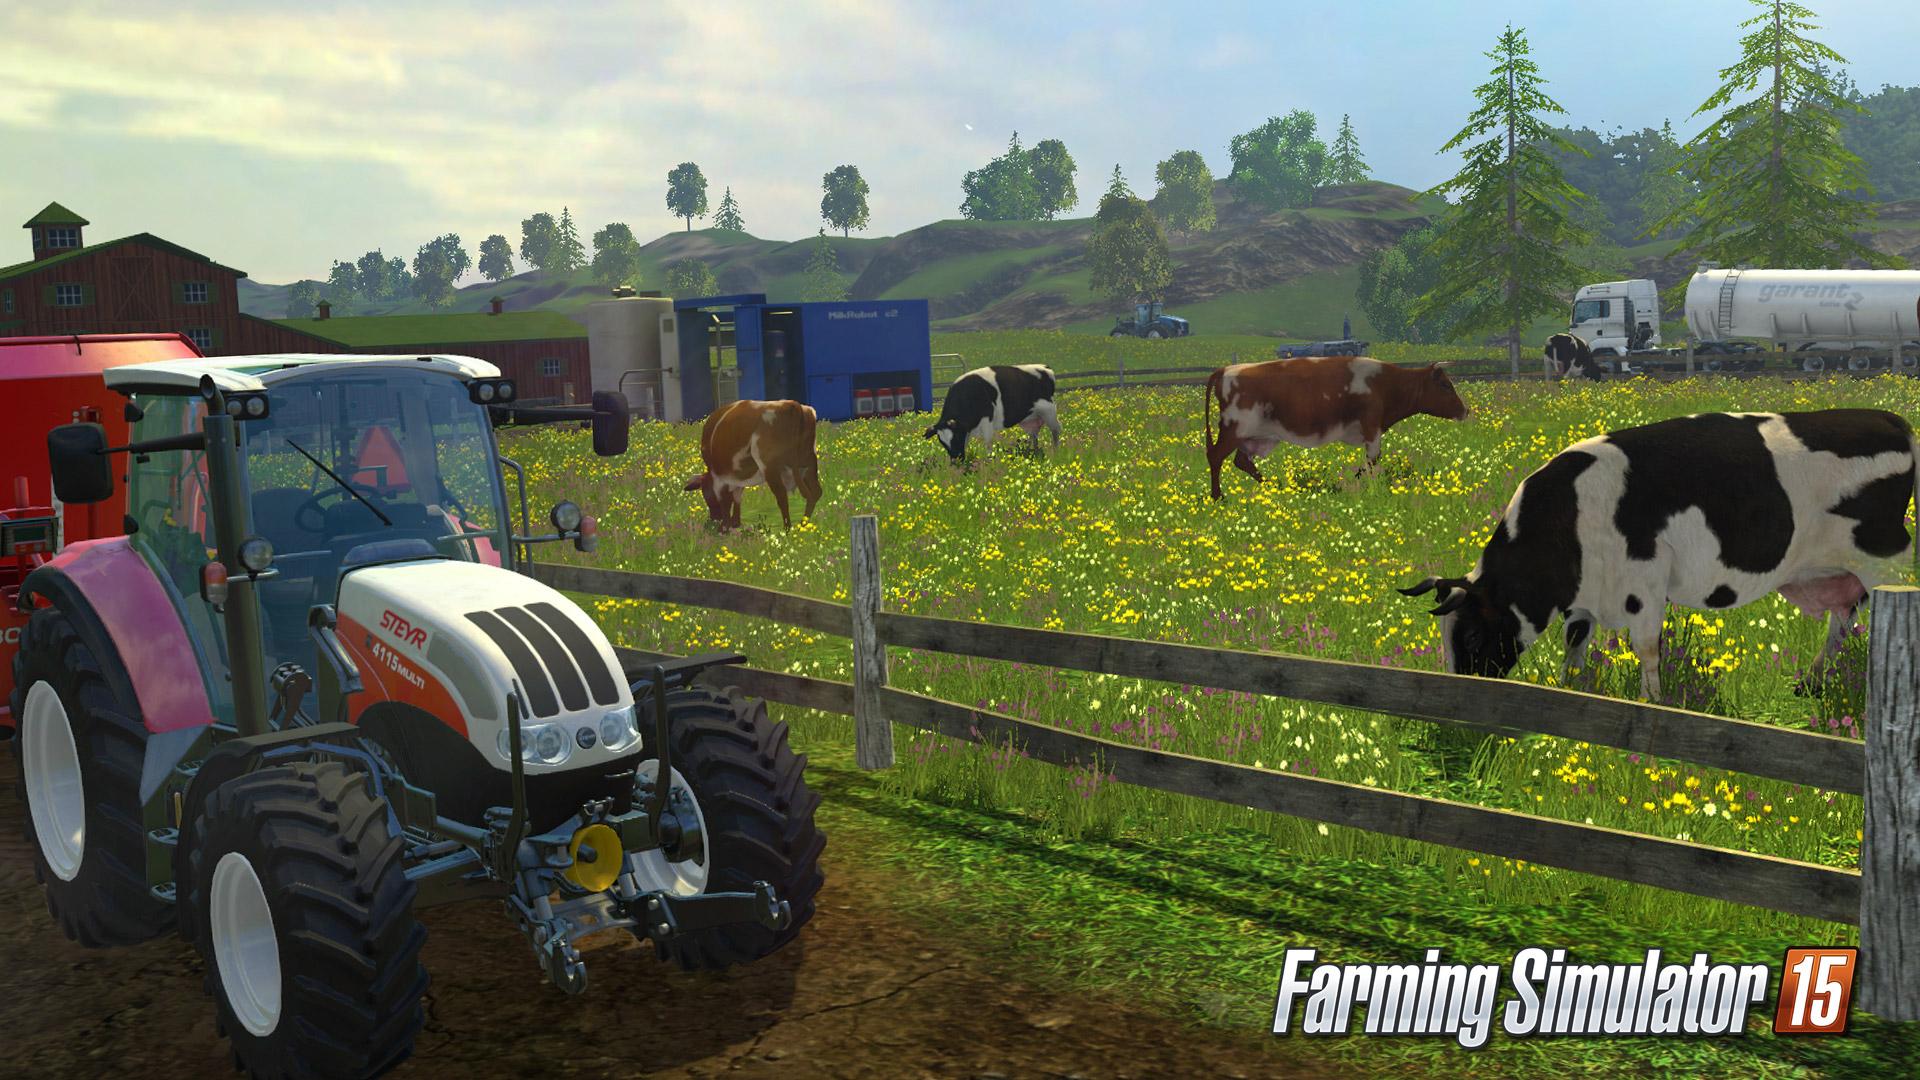 Farming Simulator 15 brings serious farm simulation to consoles in